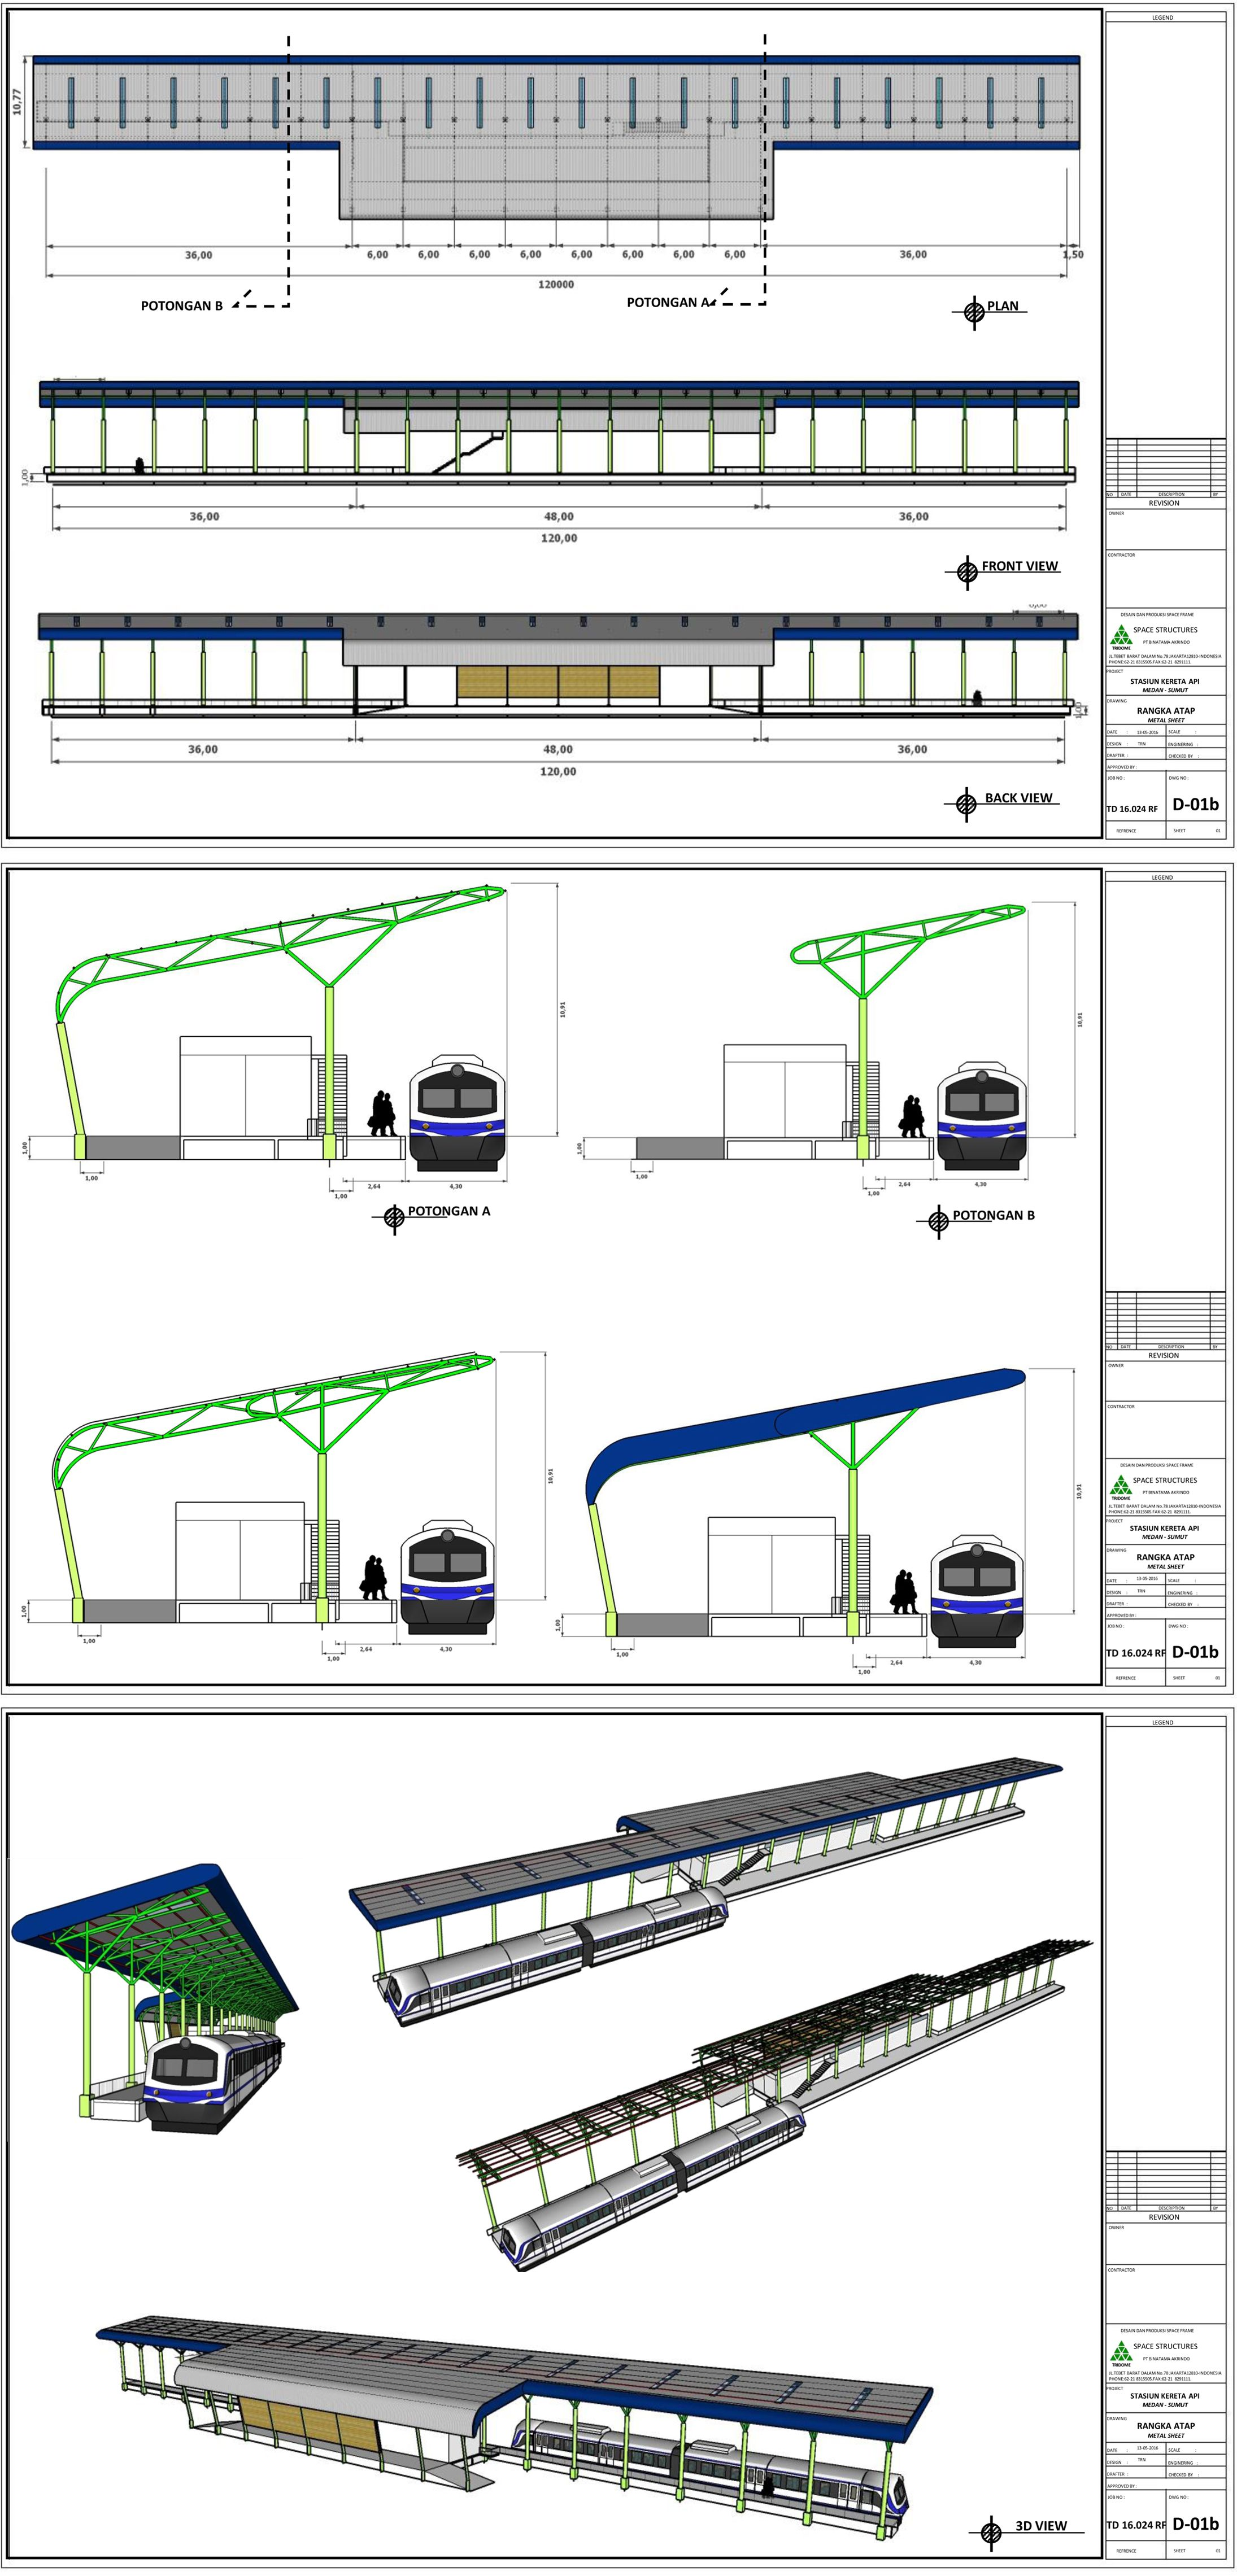 Aplikator Baja Ringan Medan Peron Stasiun Kereta Di Struktur Konstruksi Konventional